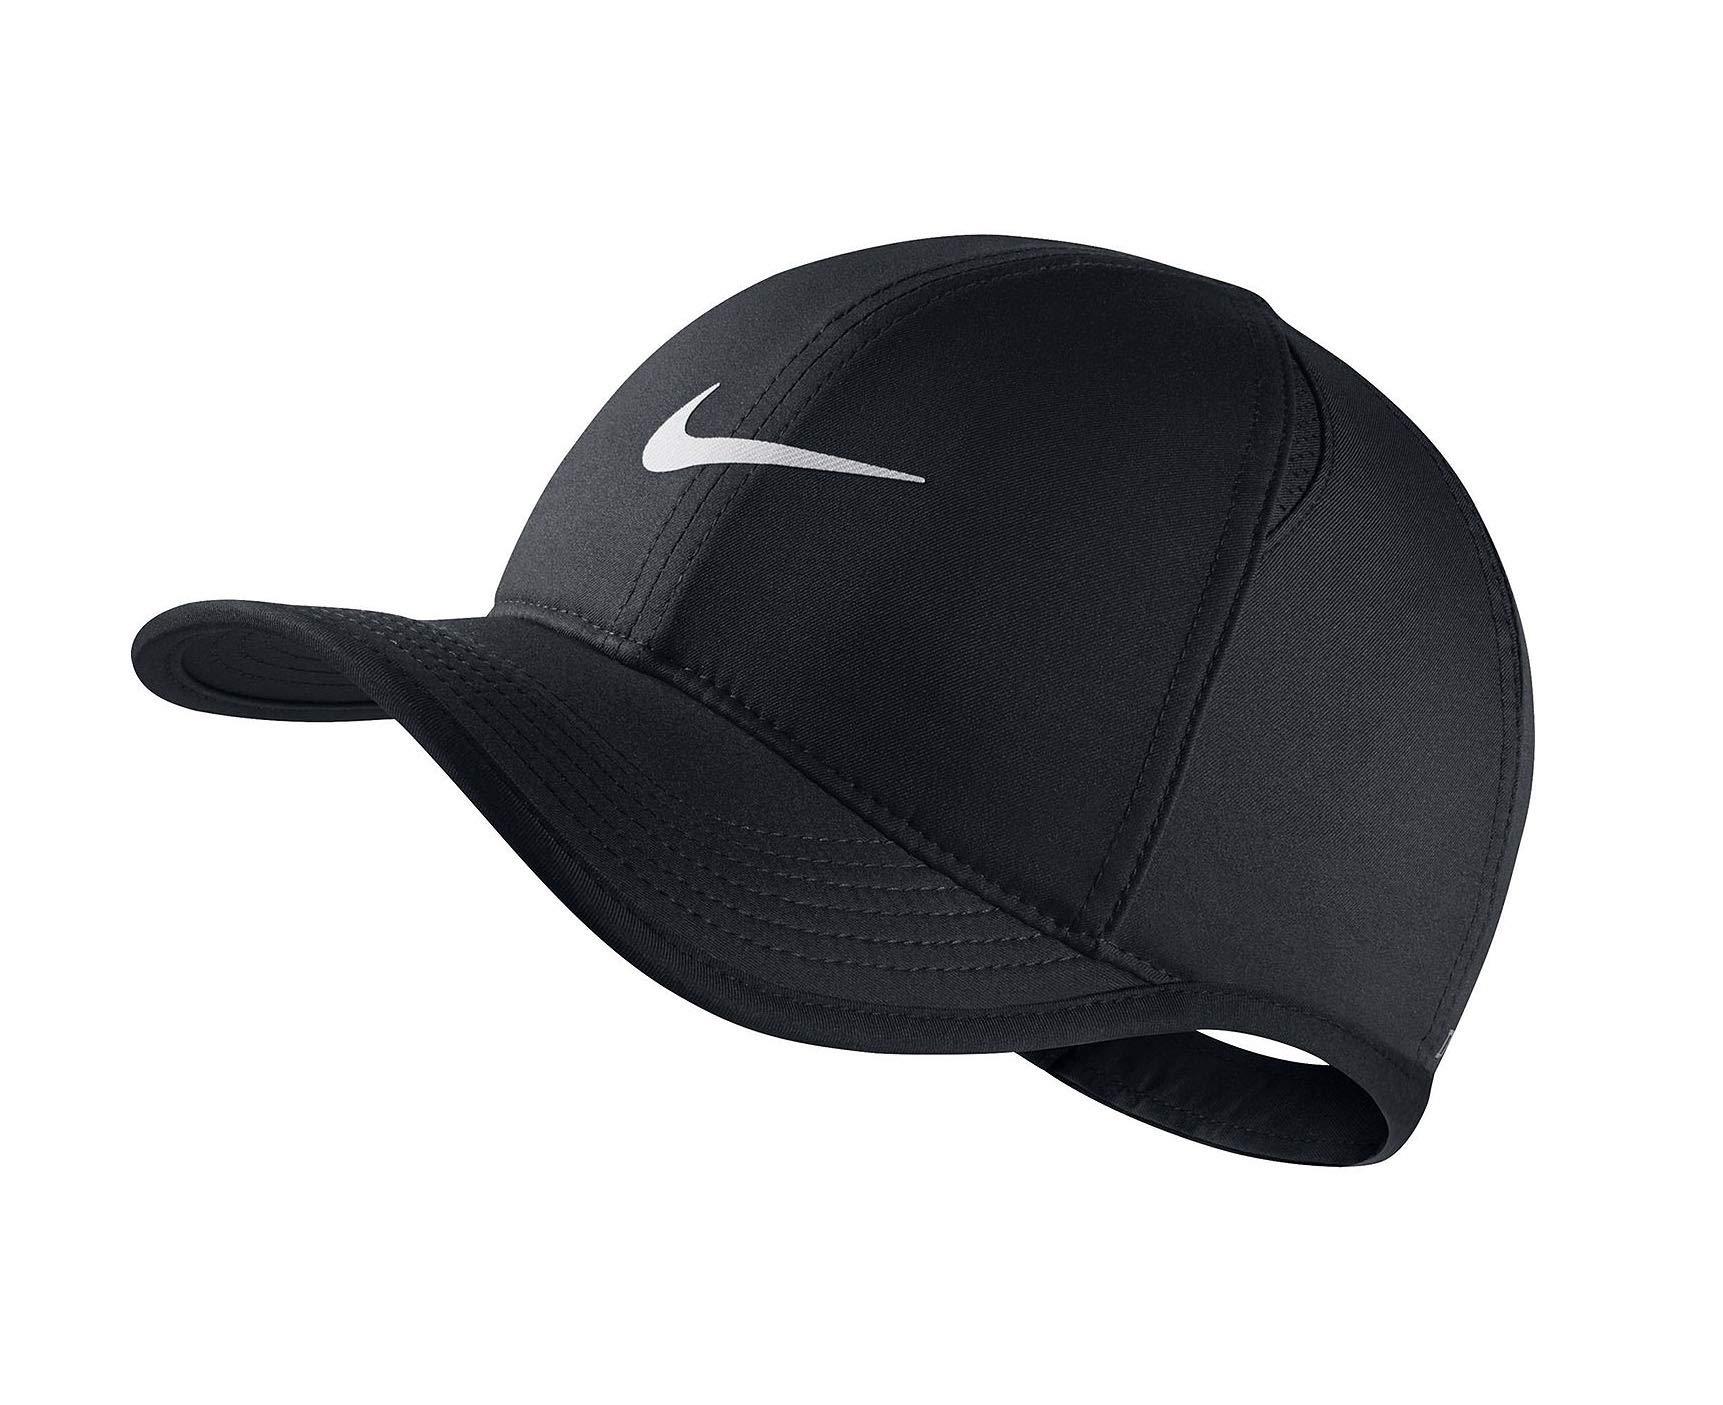 Nike Boys Toddler Baseball Hat Cap Black 2-4T